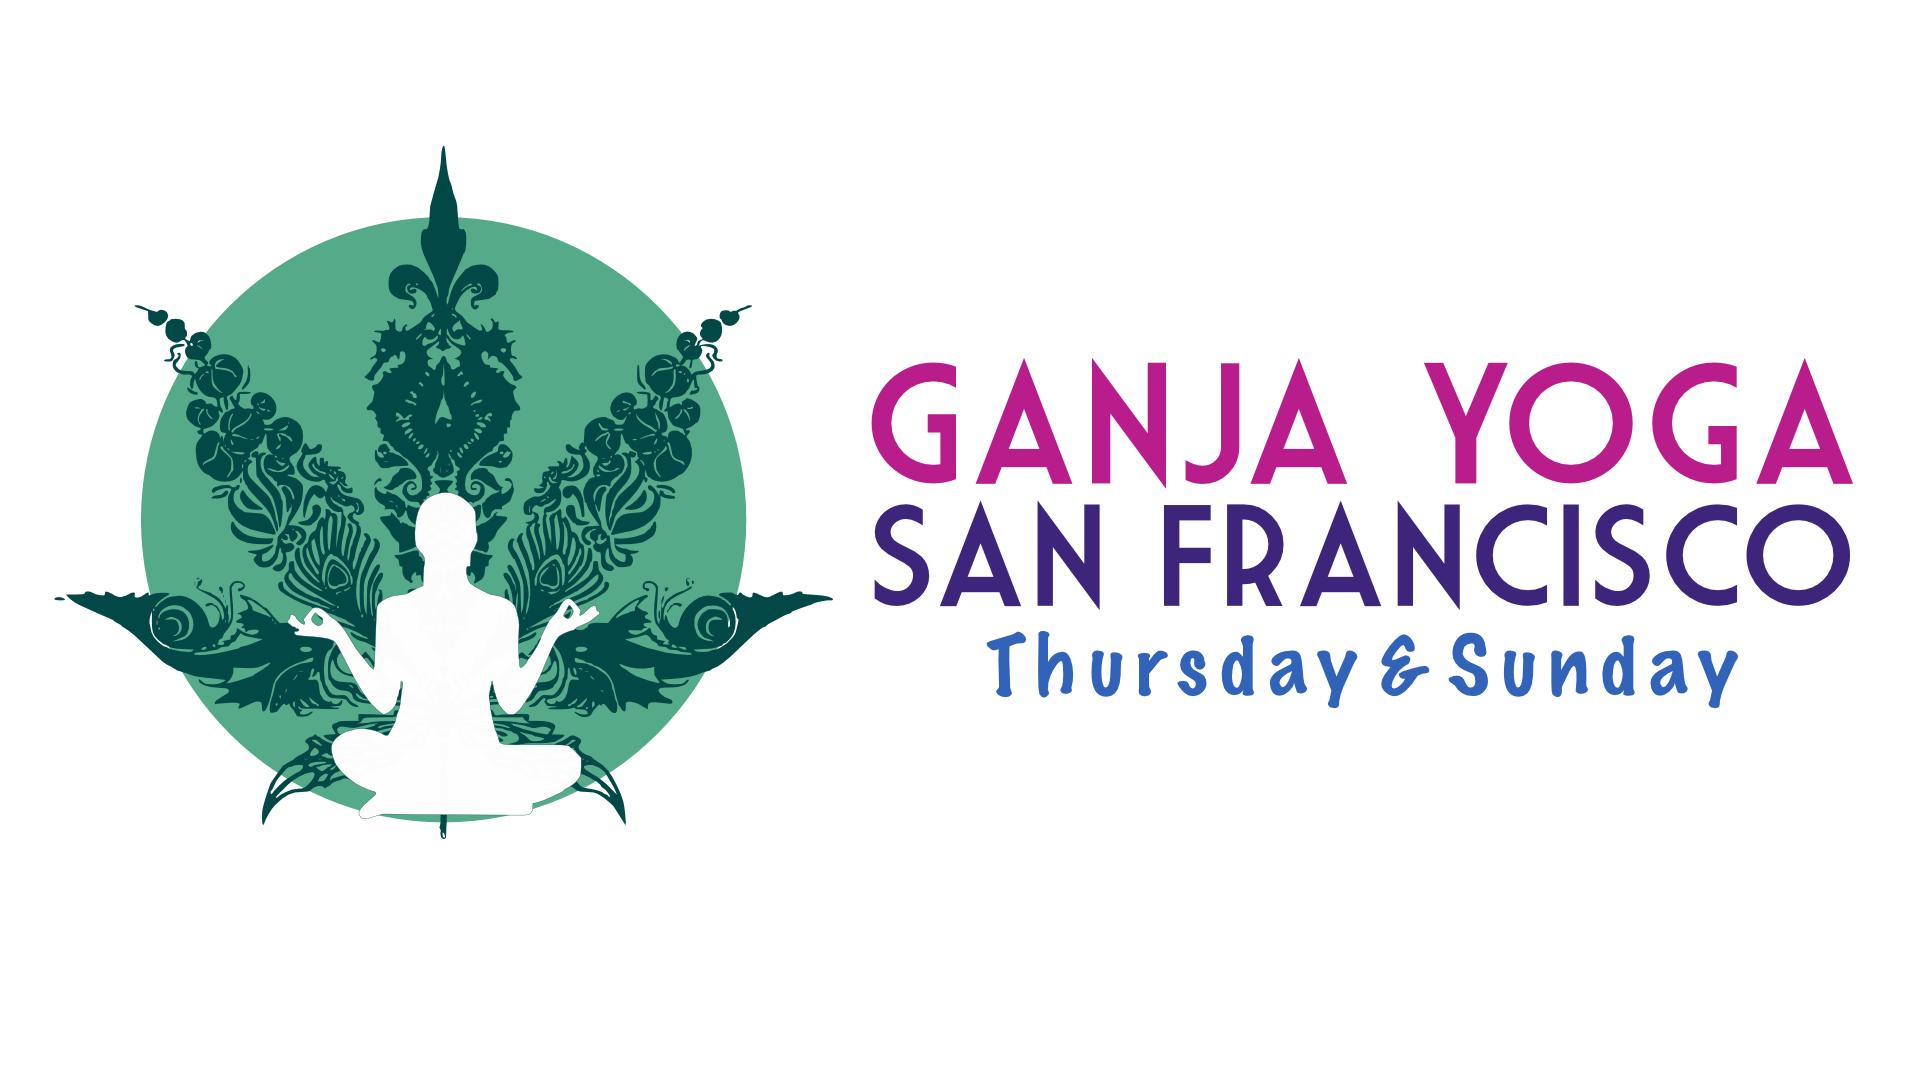 Ganja Yoga San Francisco - Self-Care Sunday